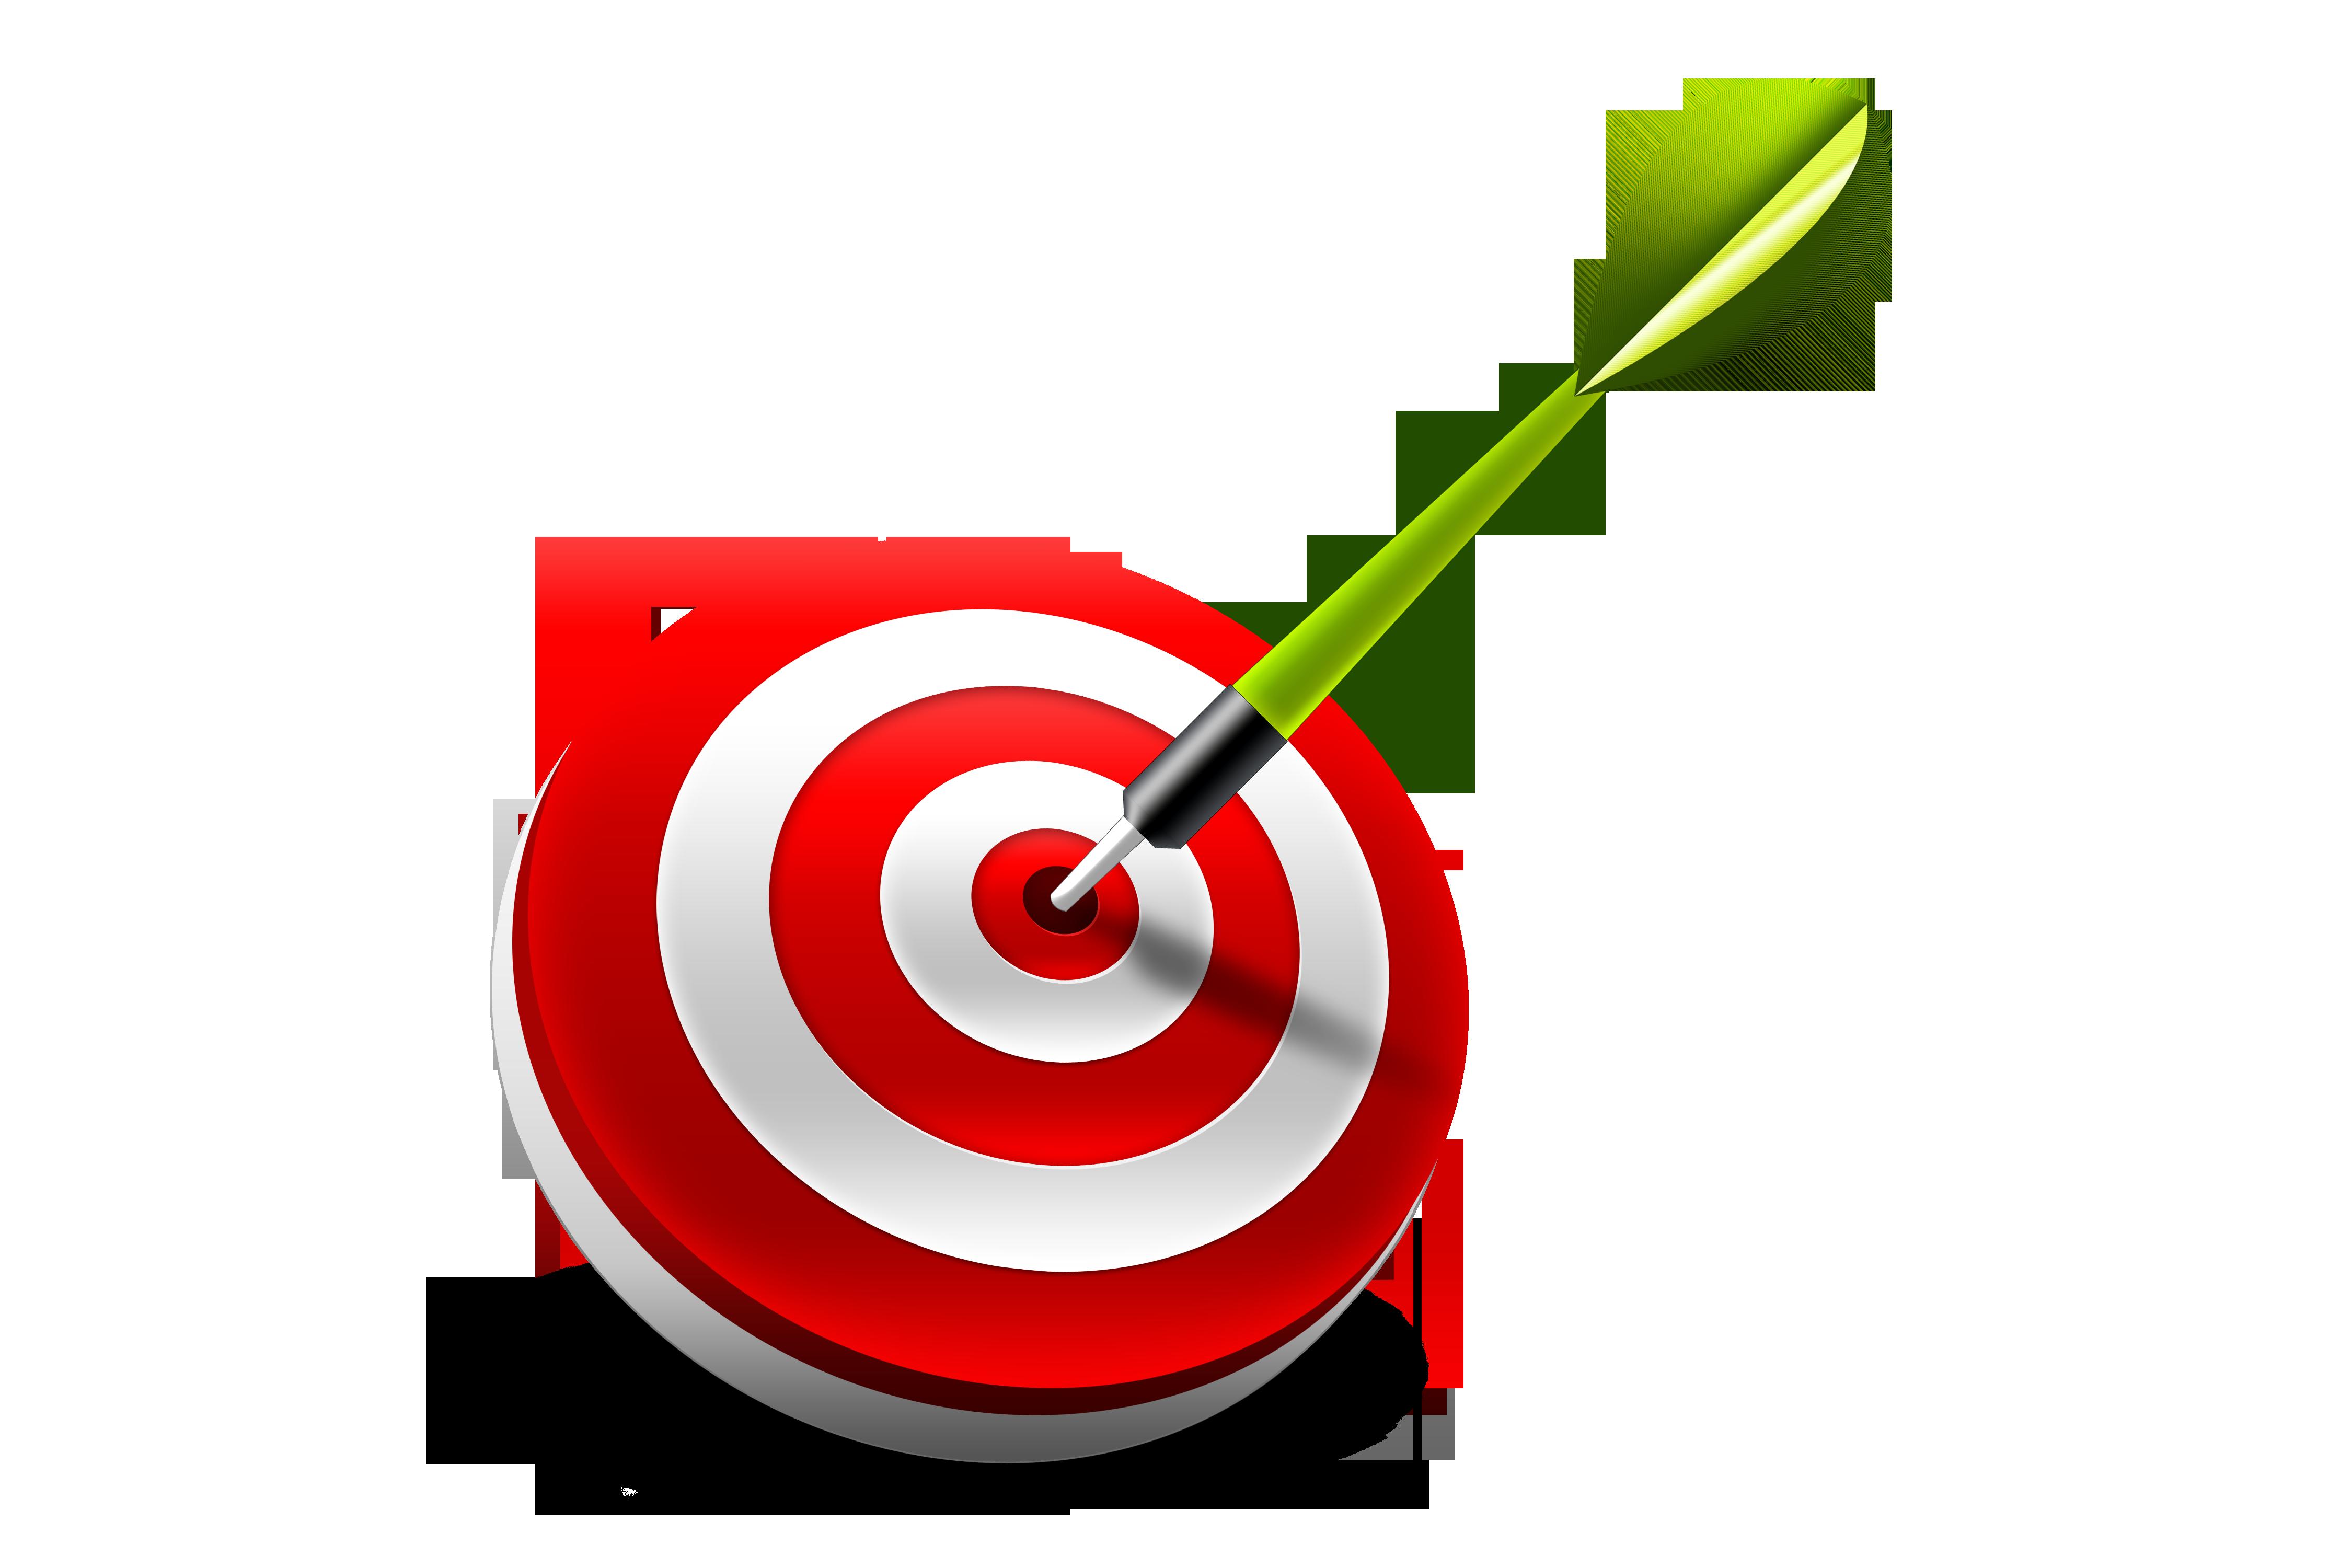 bullseye-clipart-dart-5.png